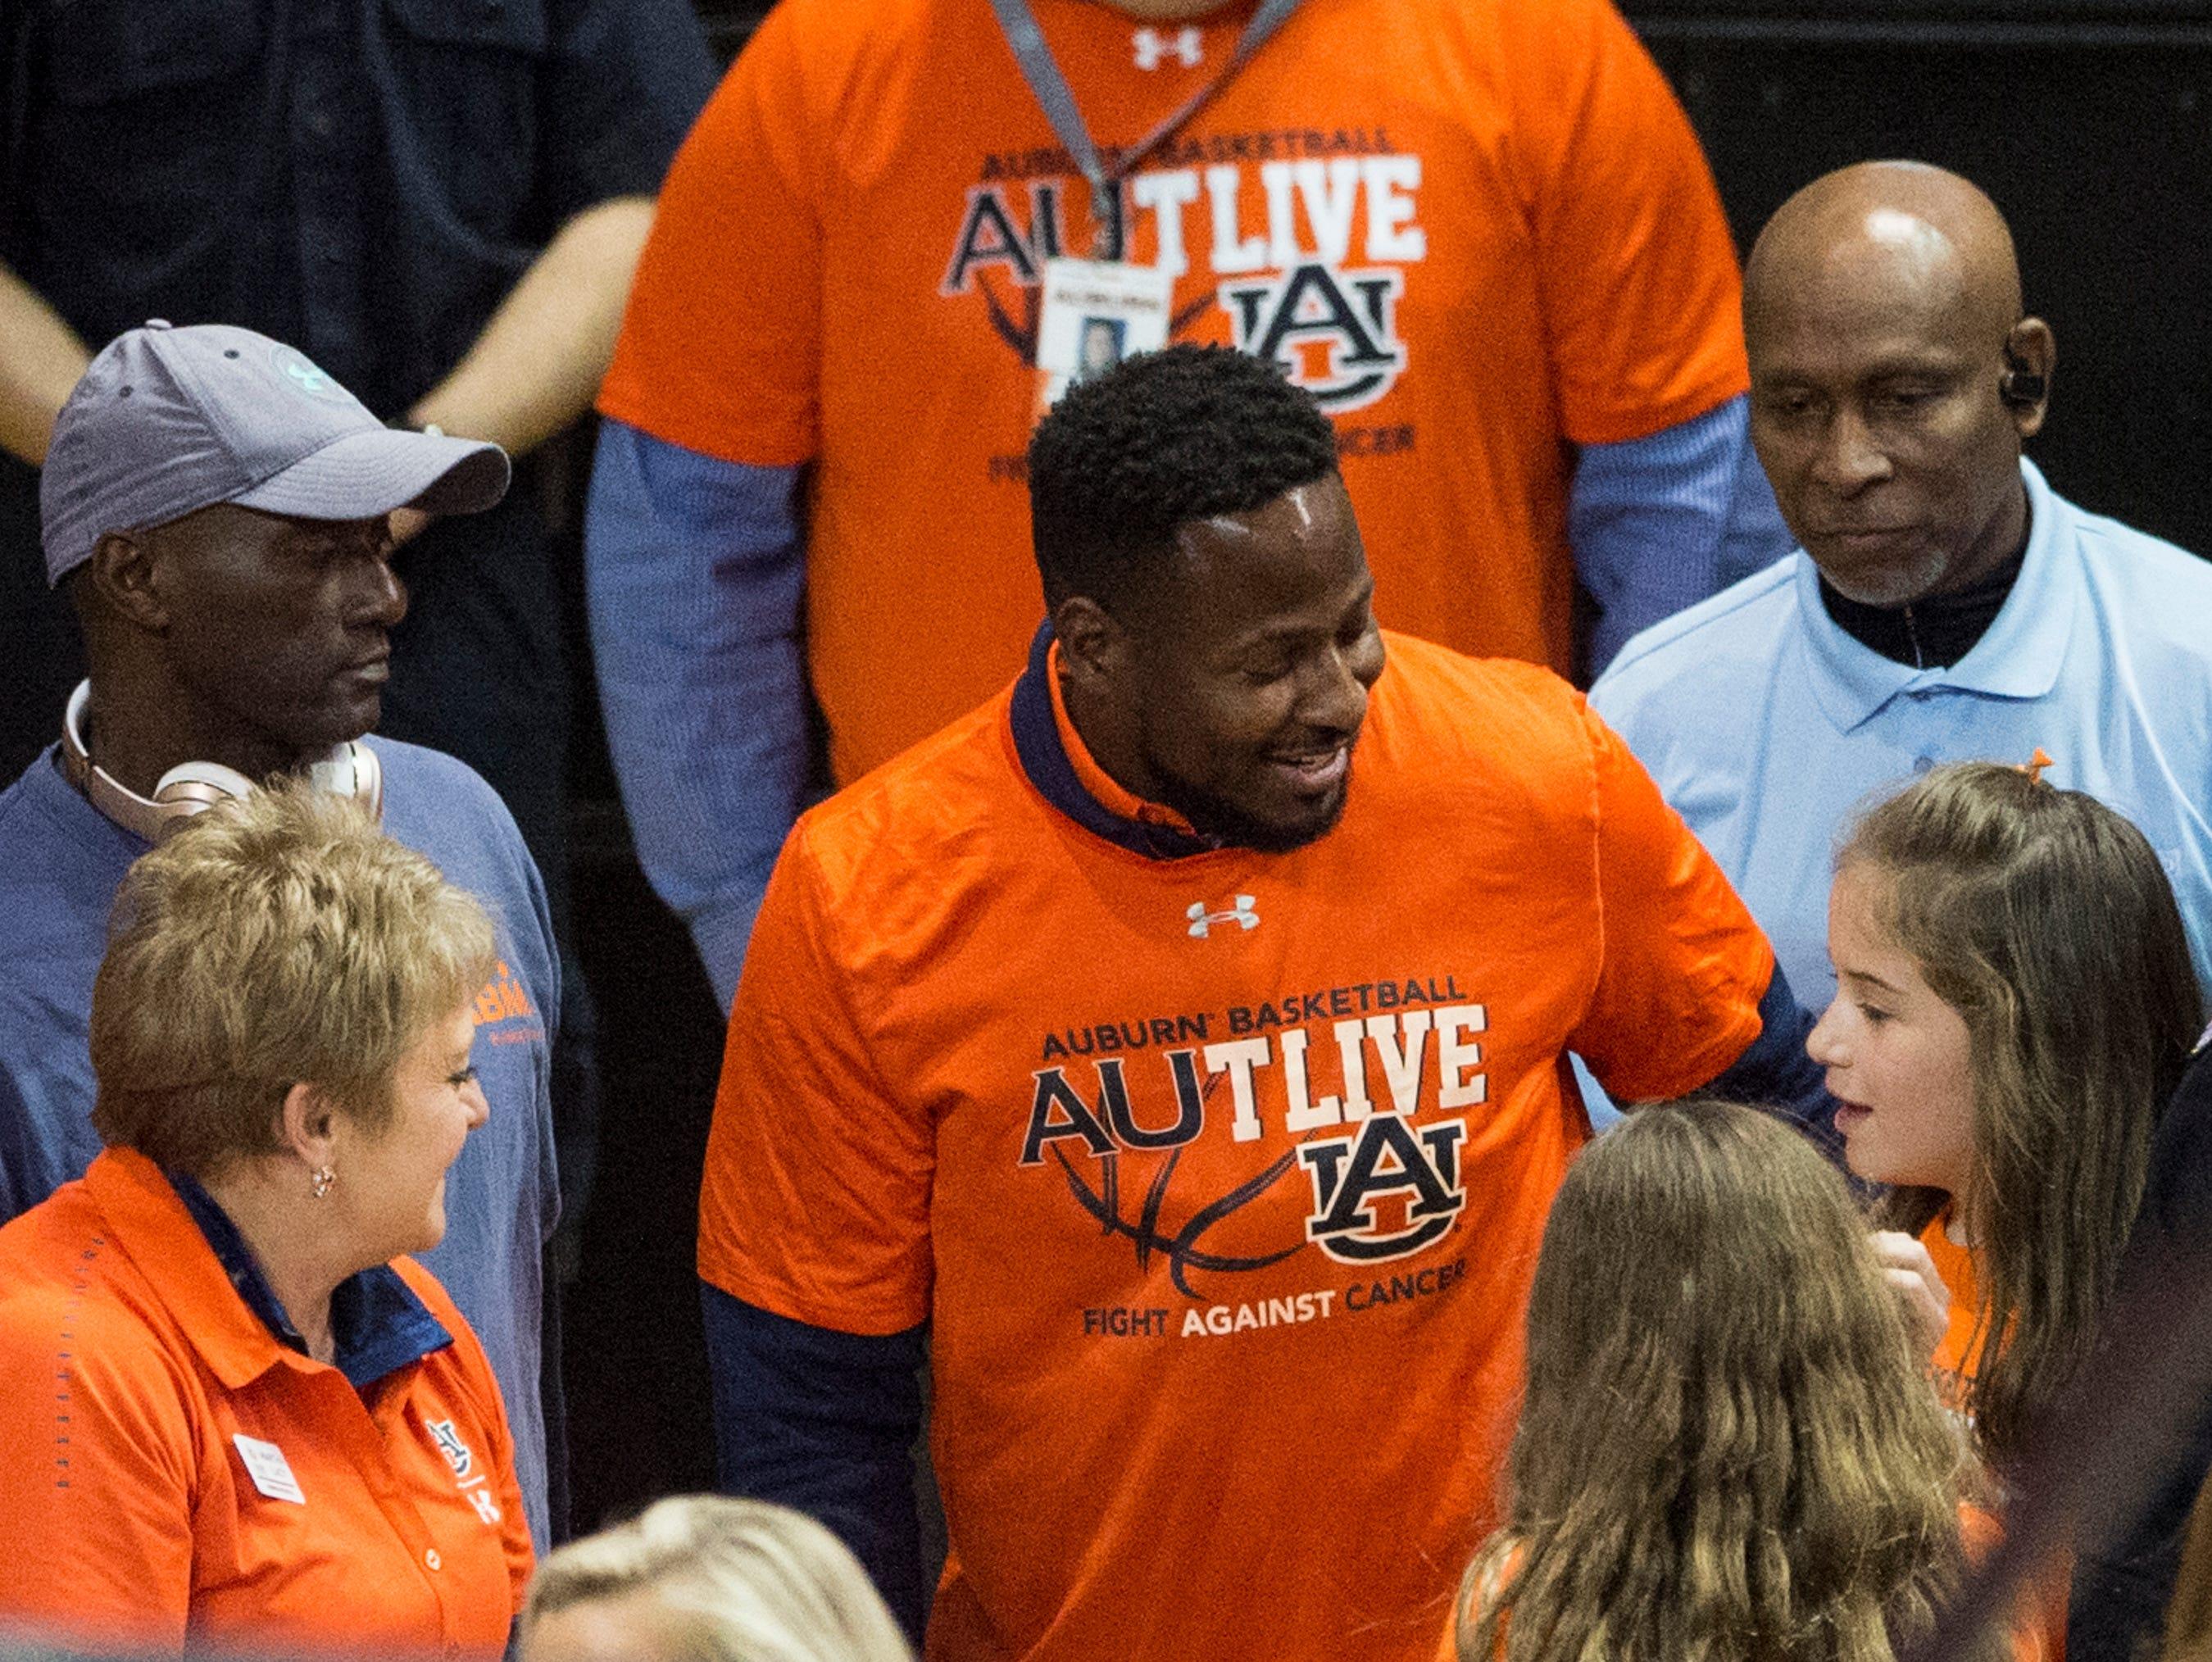 Auburn running back coach and former player Cadillac Williams greets fans at Auburn Arena in Auburn, Ala., on Saturday, Feb. 2, 2019. Auburn defeated Alabama 84-63.